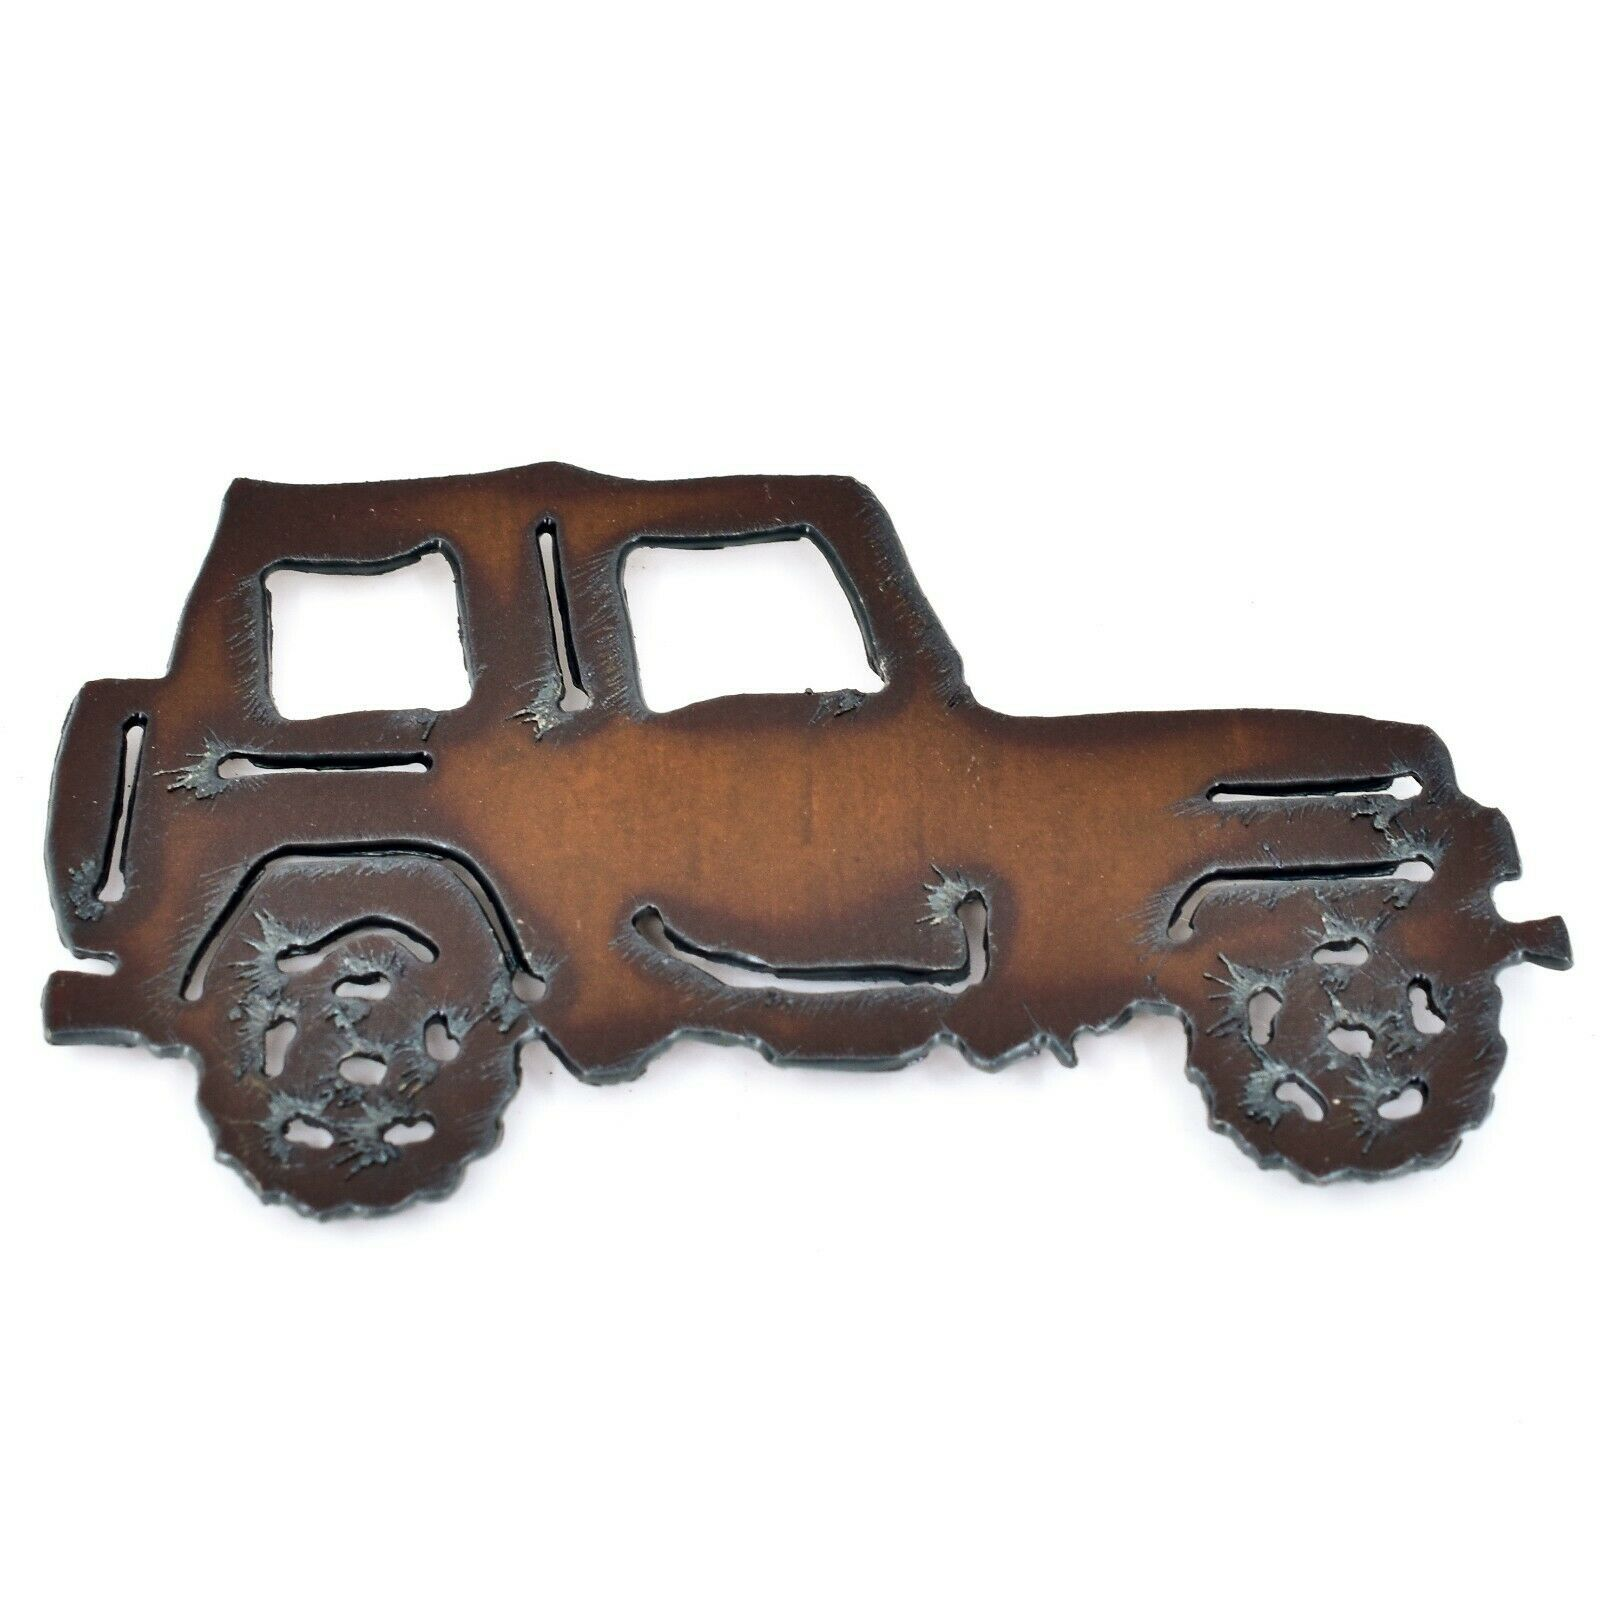 "Rustic Rusted Patina Iron Metal Cutout Jeep Wrangler 4.5"" Refrigerator Magnet"